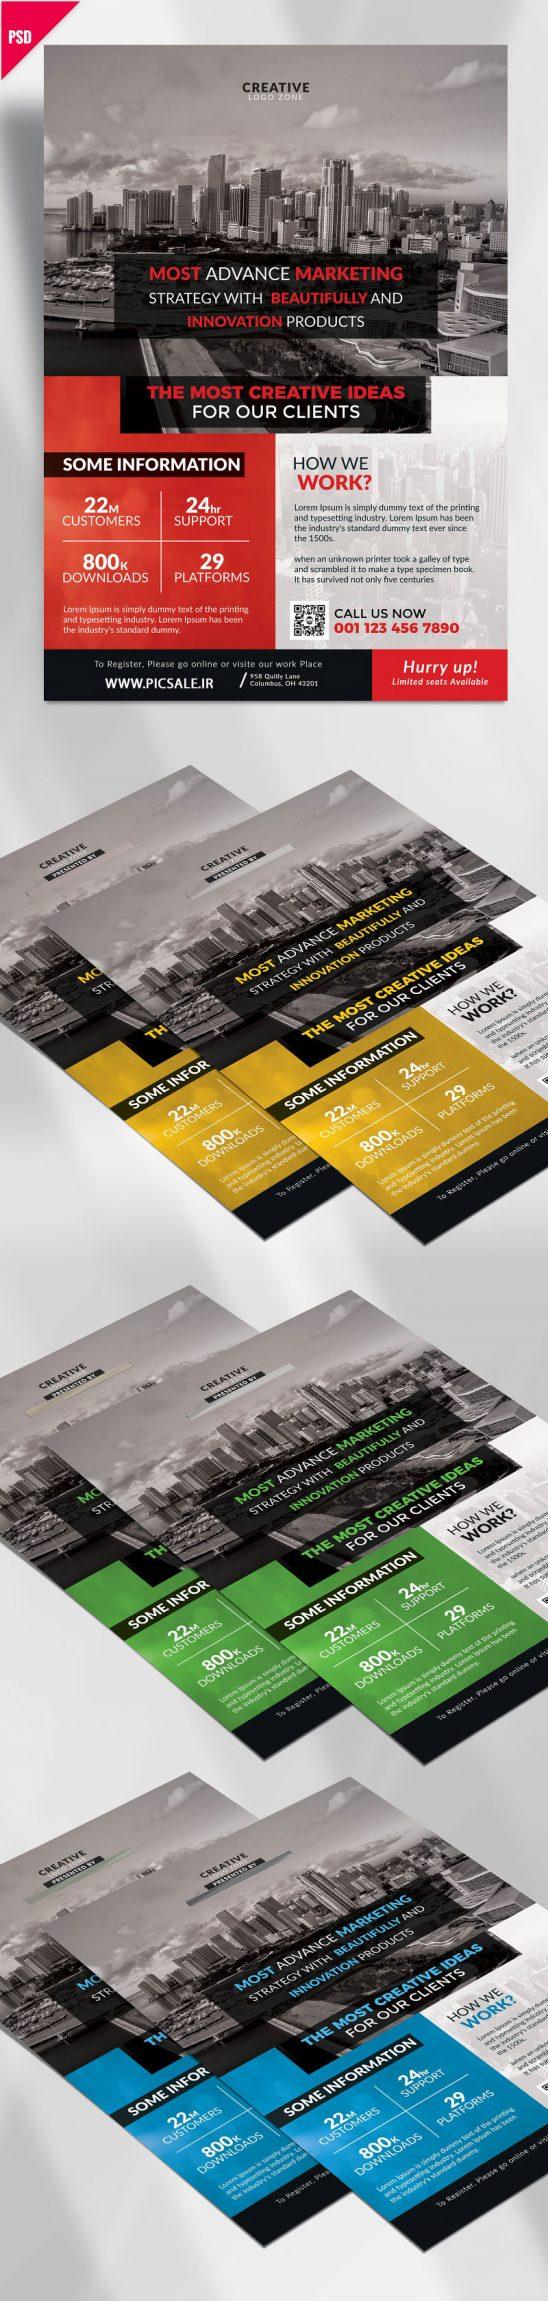 p358 548x2301 - تراکت ساختمانی معرفی خدمات بصورت لایه باز